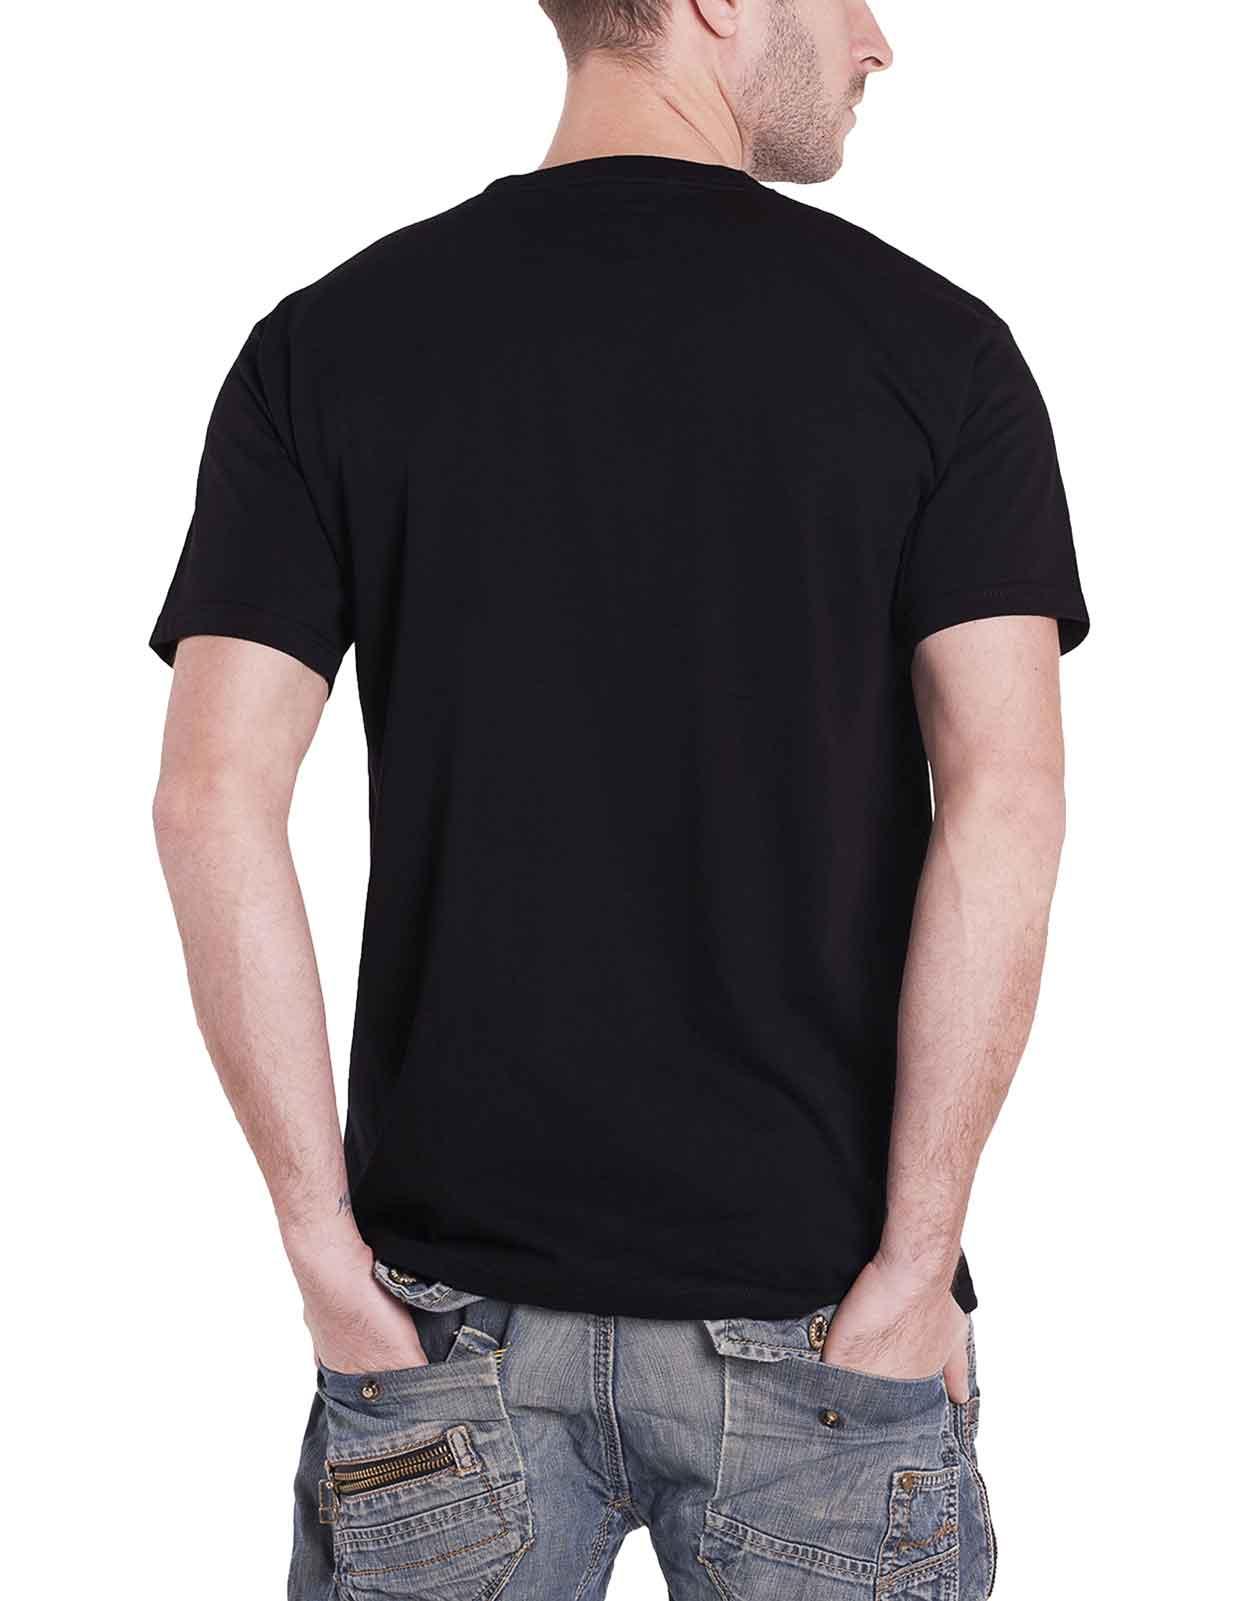 Motorhead-T-Shirt-Lemmy-RIP-England-warpig-clean-your-clock-official-new-mens Indexbild 55